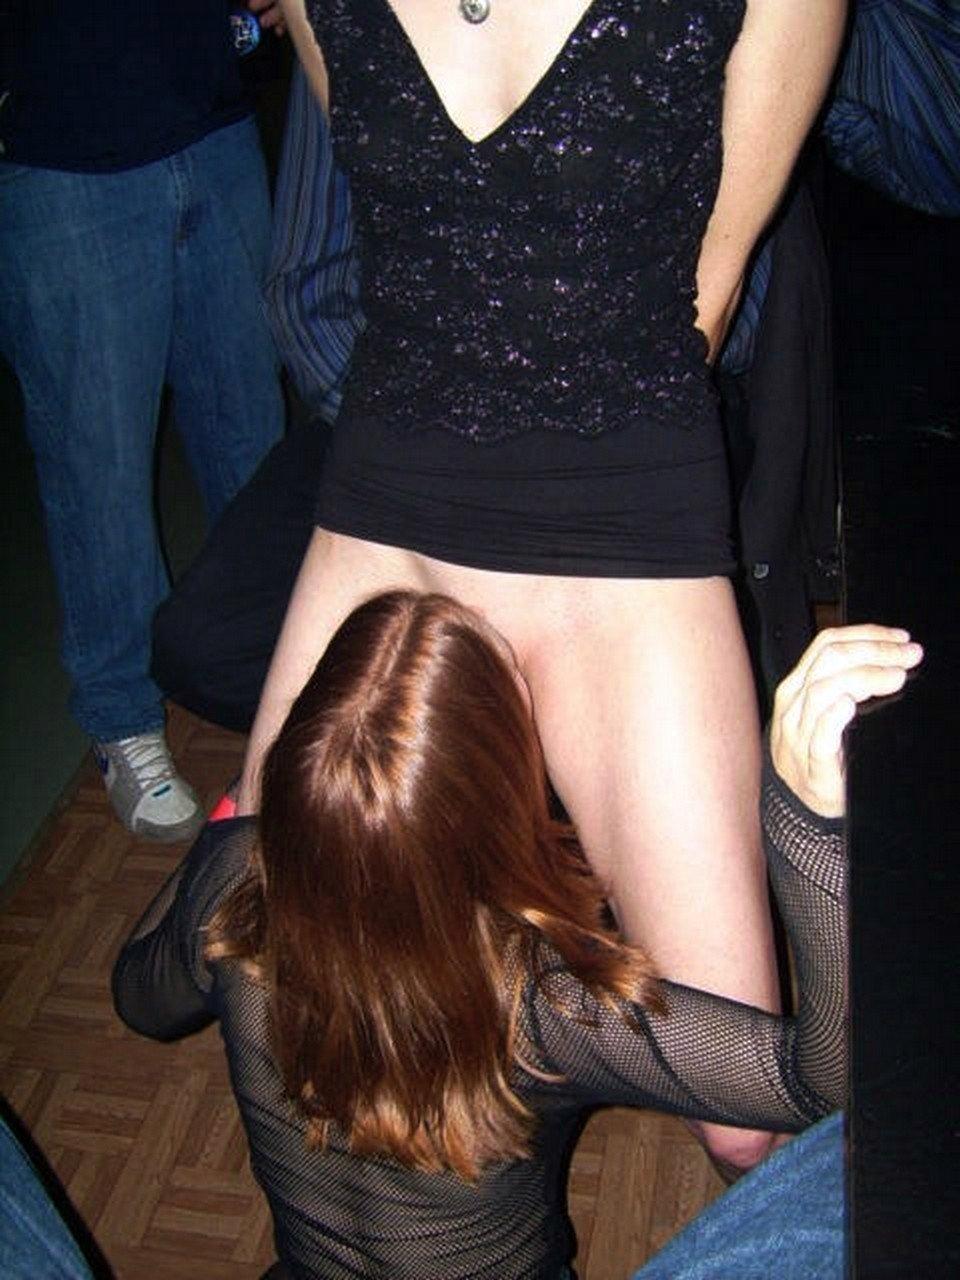 Chicas Borrachas XXX